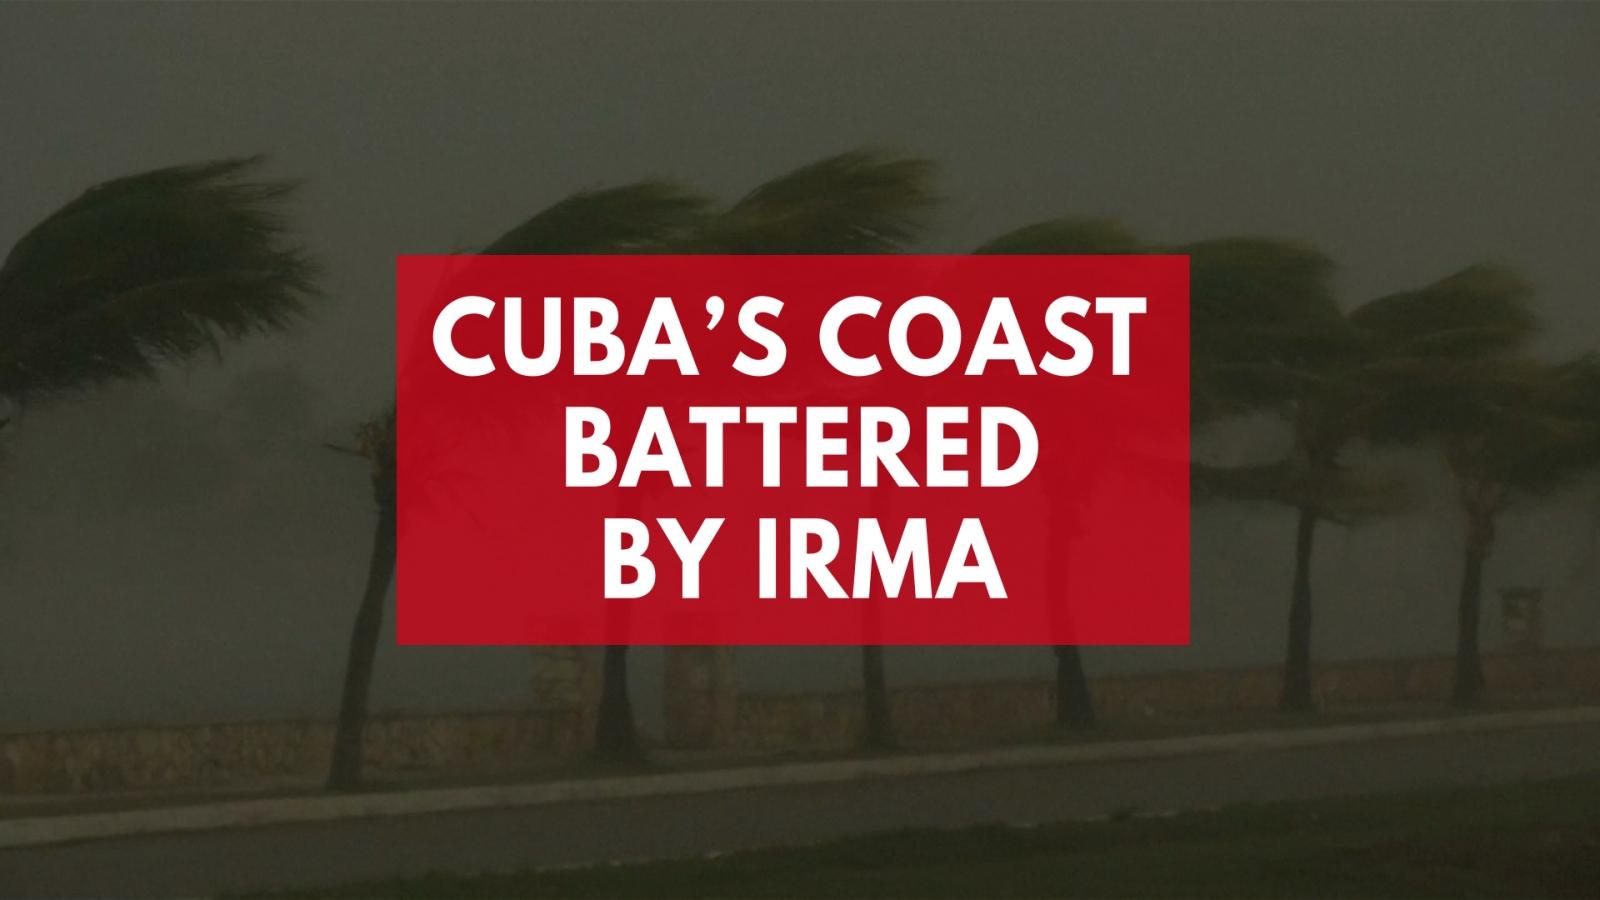 cubas-coast-battered-by-irma